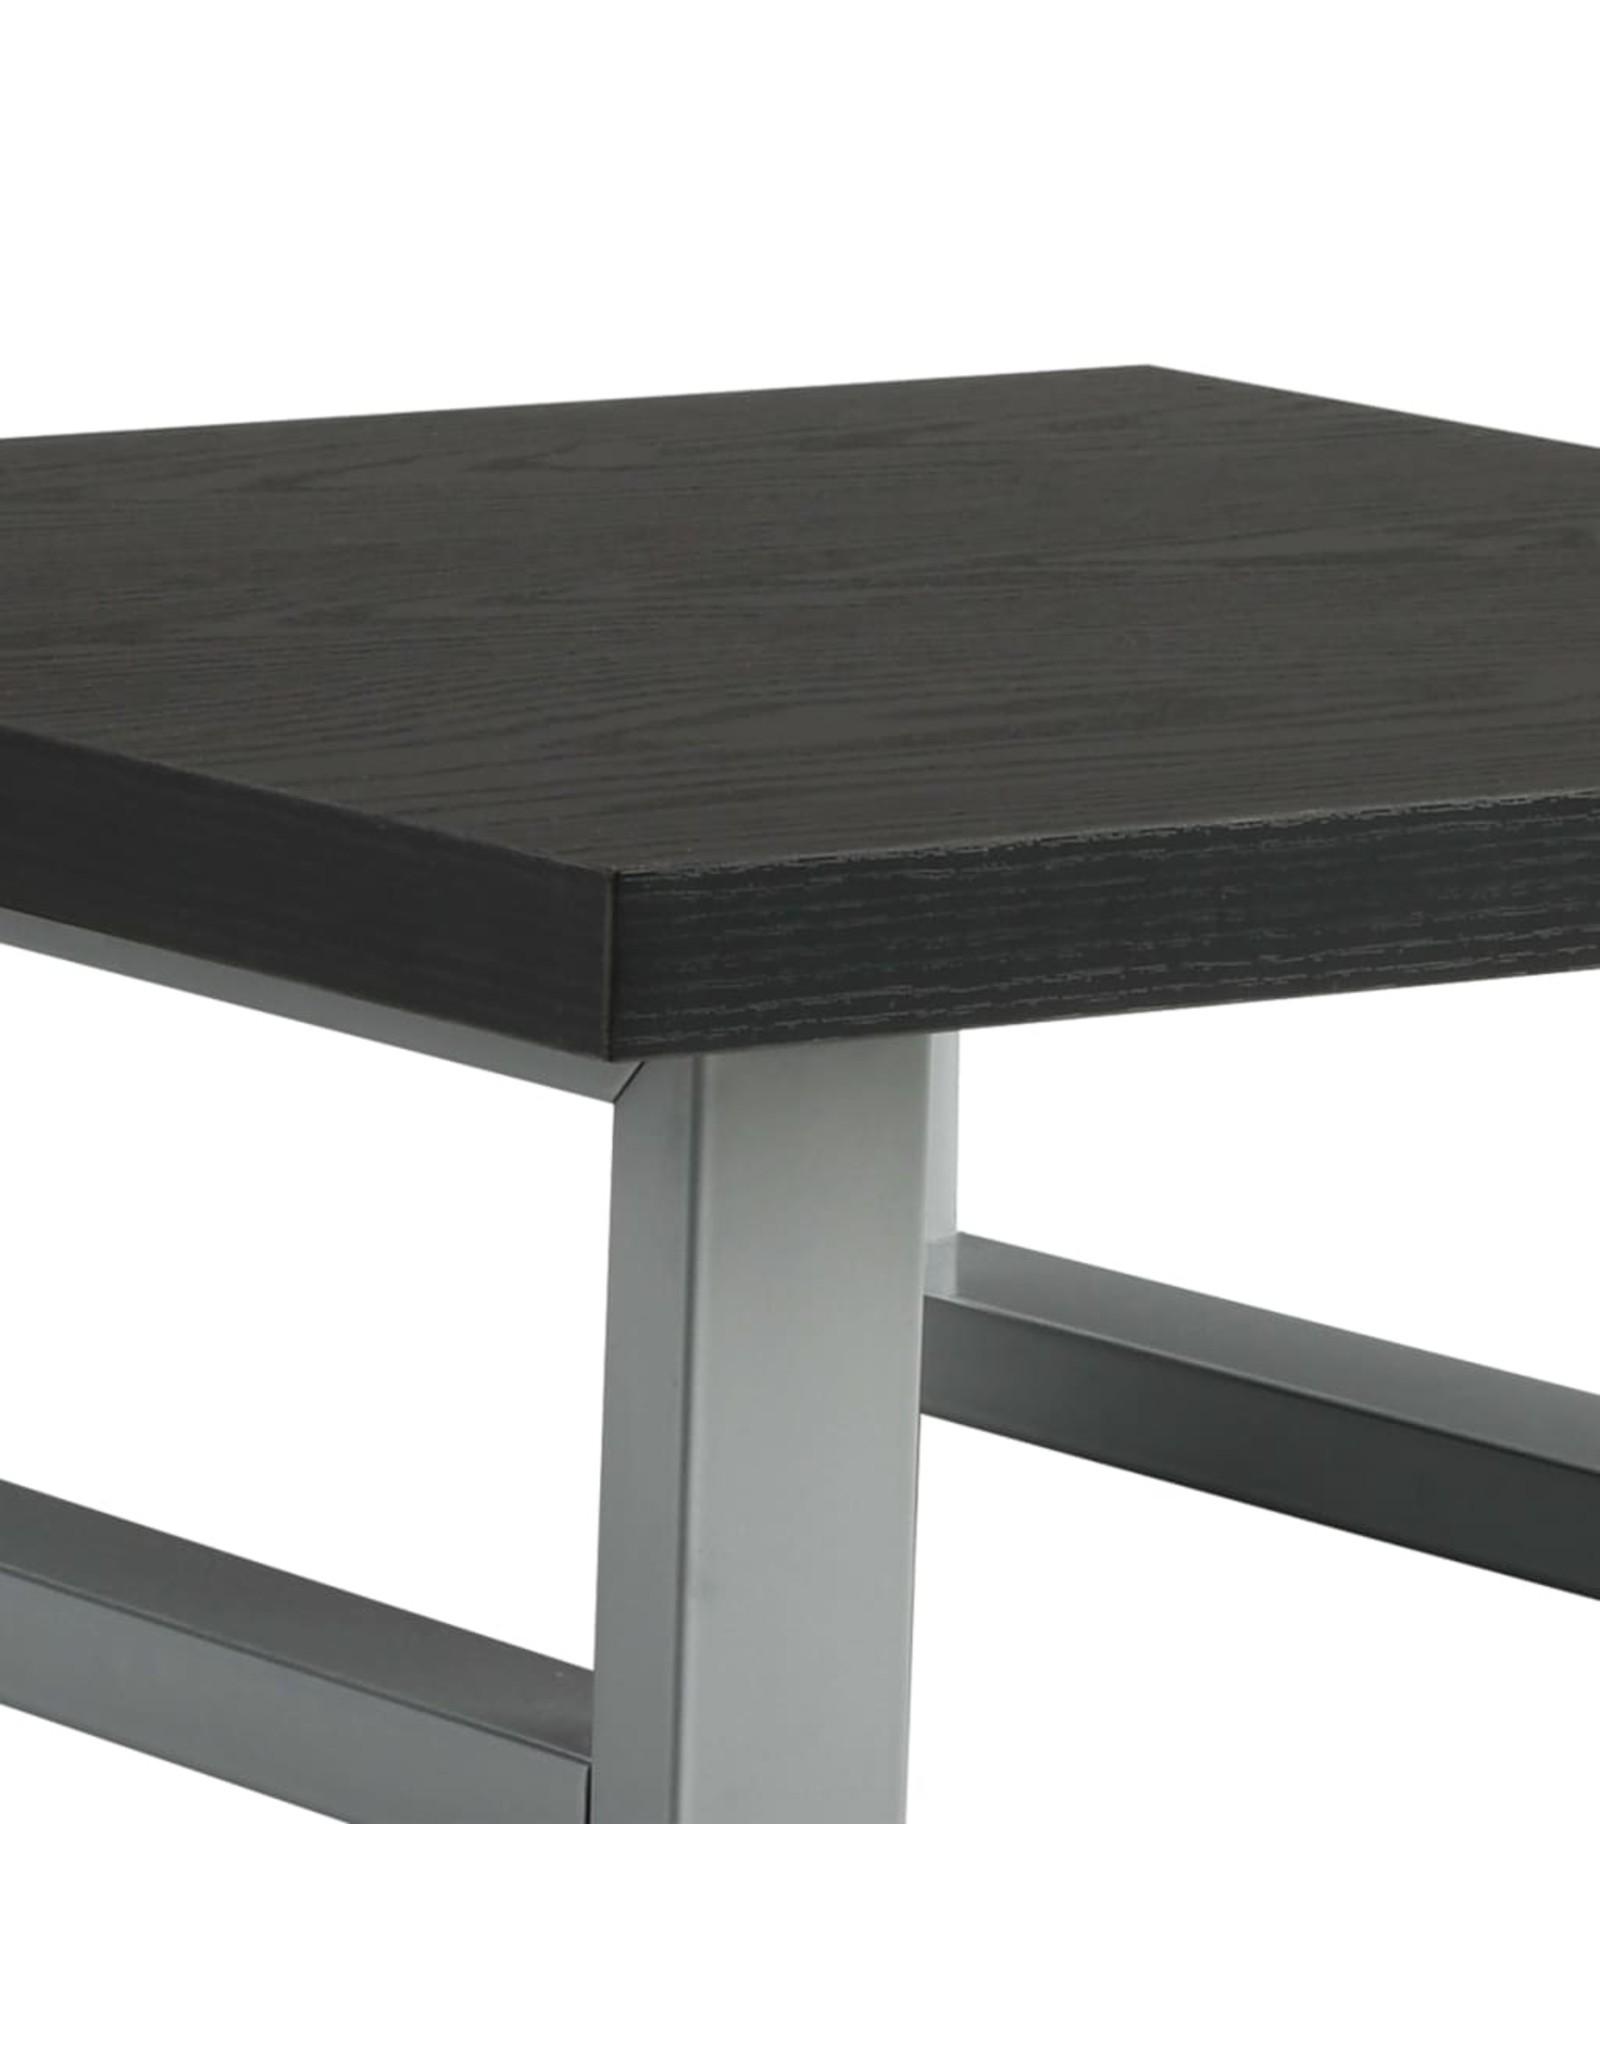 Badkamermeubel 40x40x16,3 cm zwart